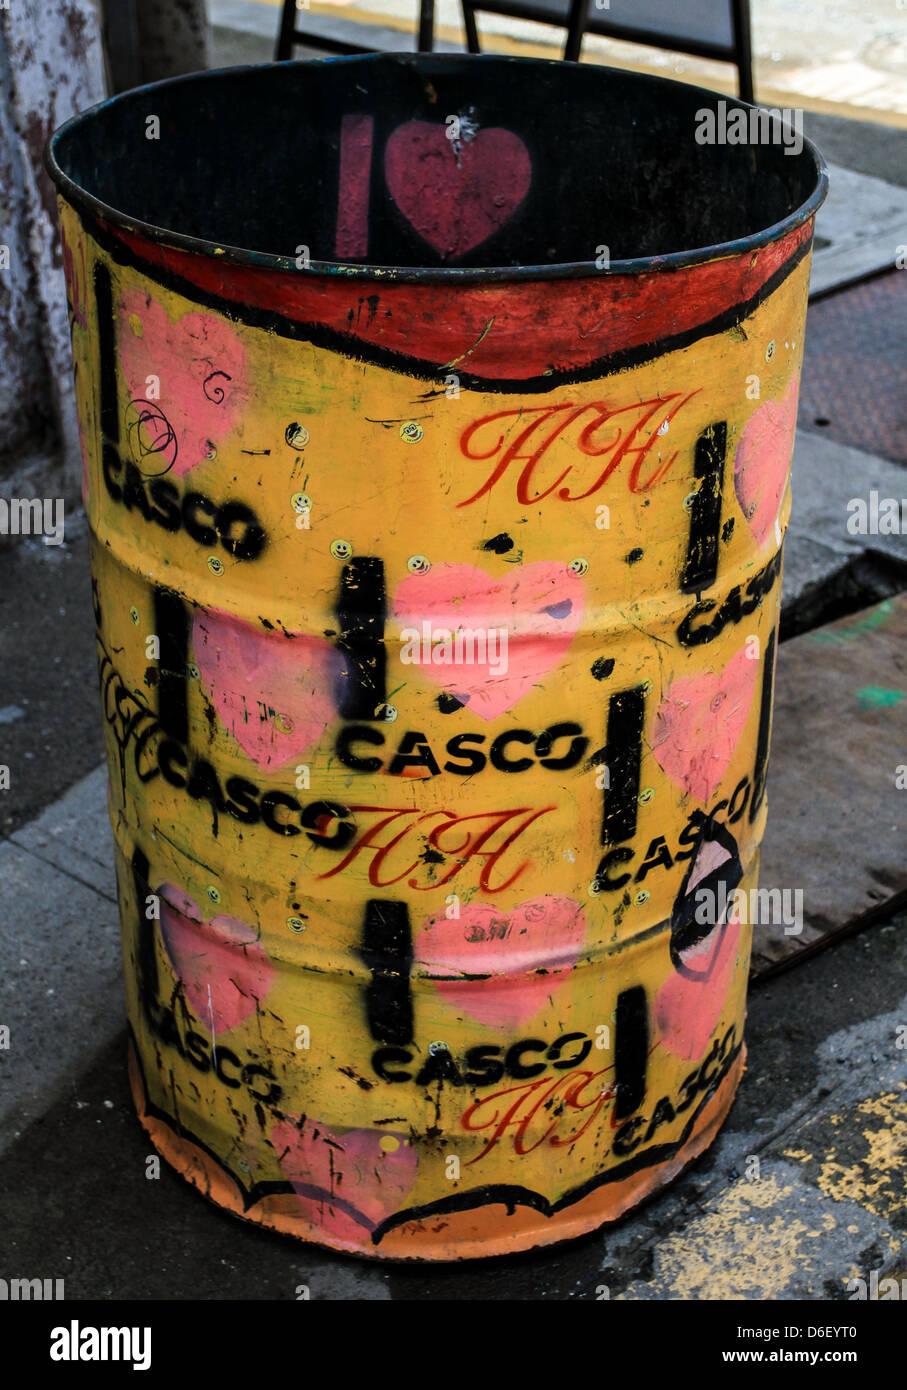 Colourful graffiti trash can - Stock Image